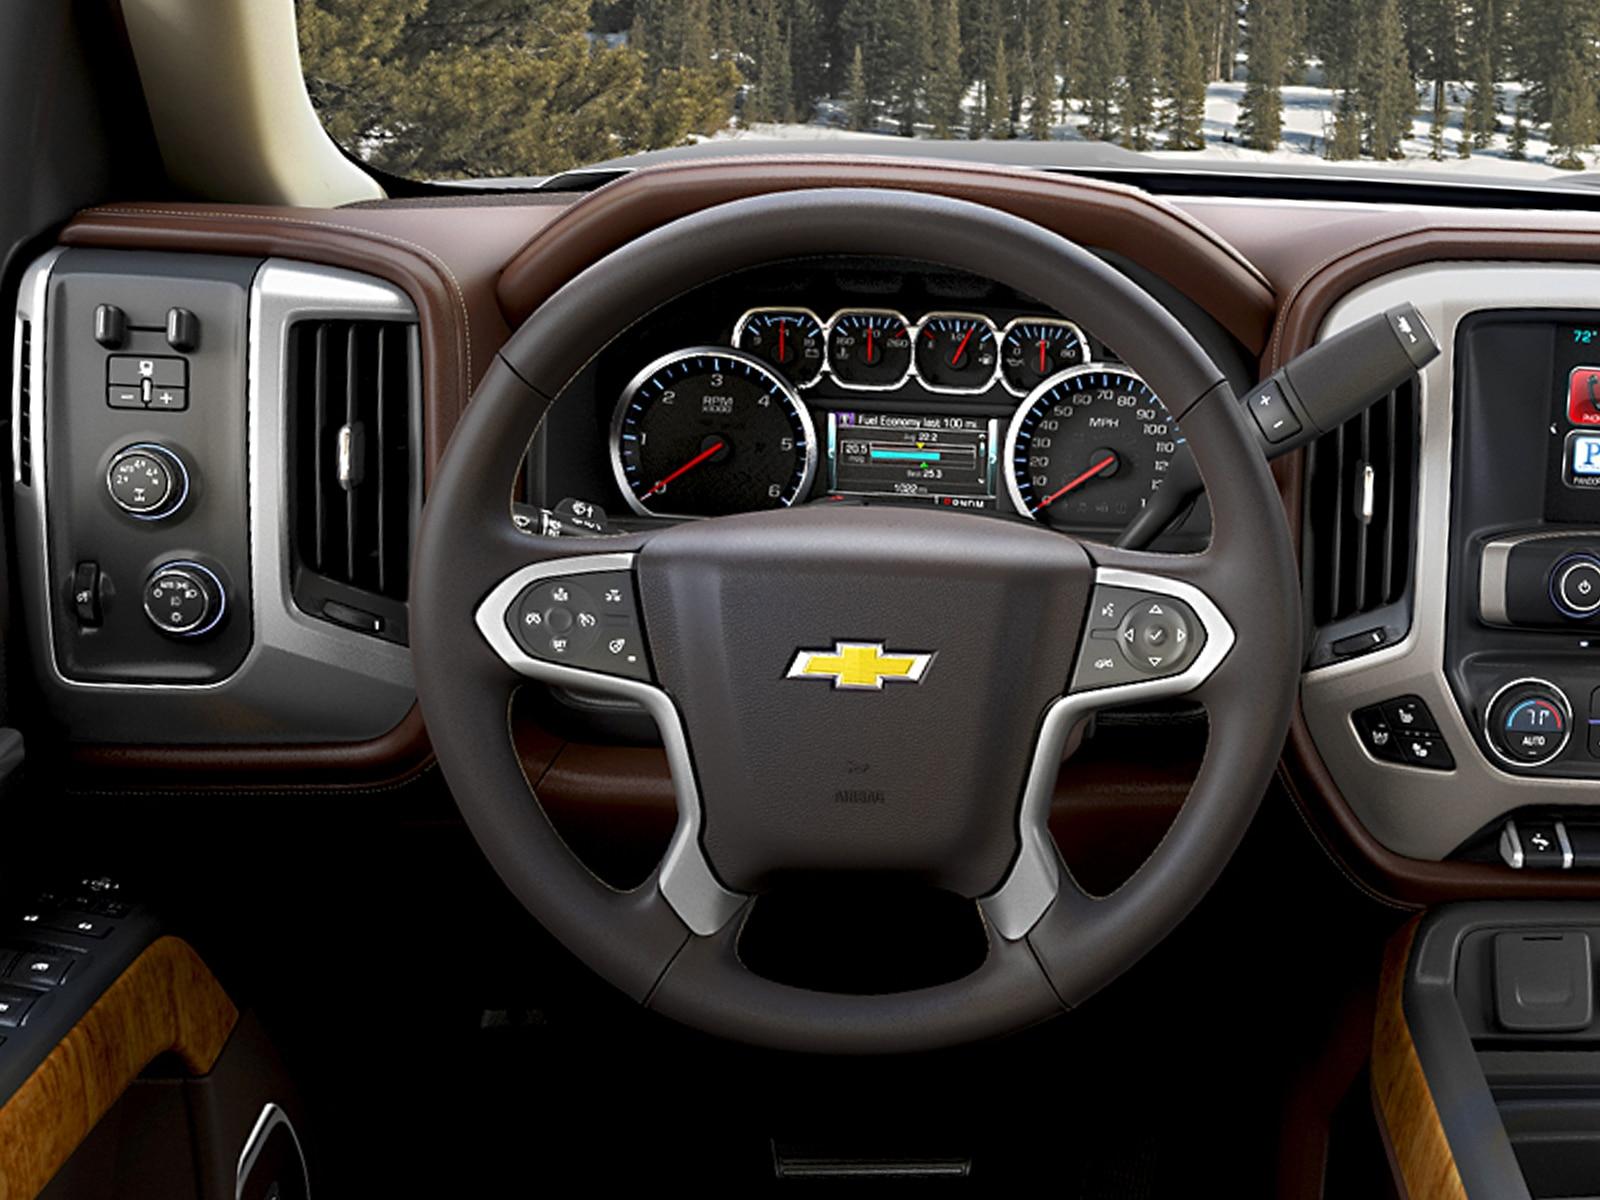 2014 Chevrolet Silverado First Drive Automobile Magazine Steering Wheel Some